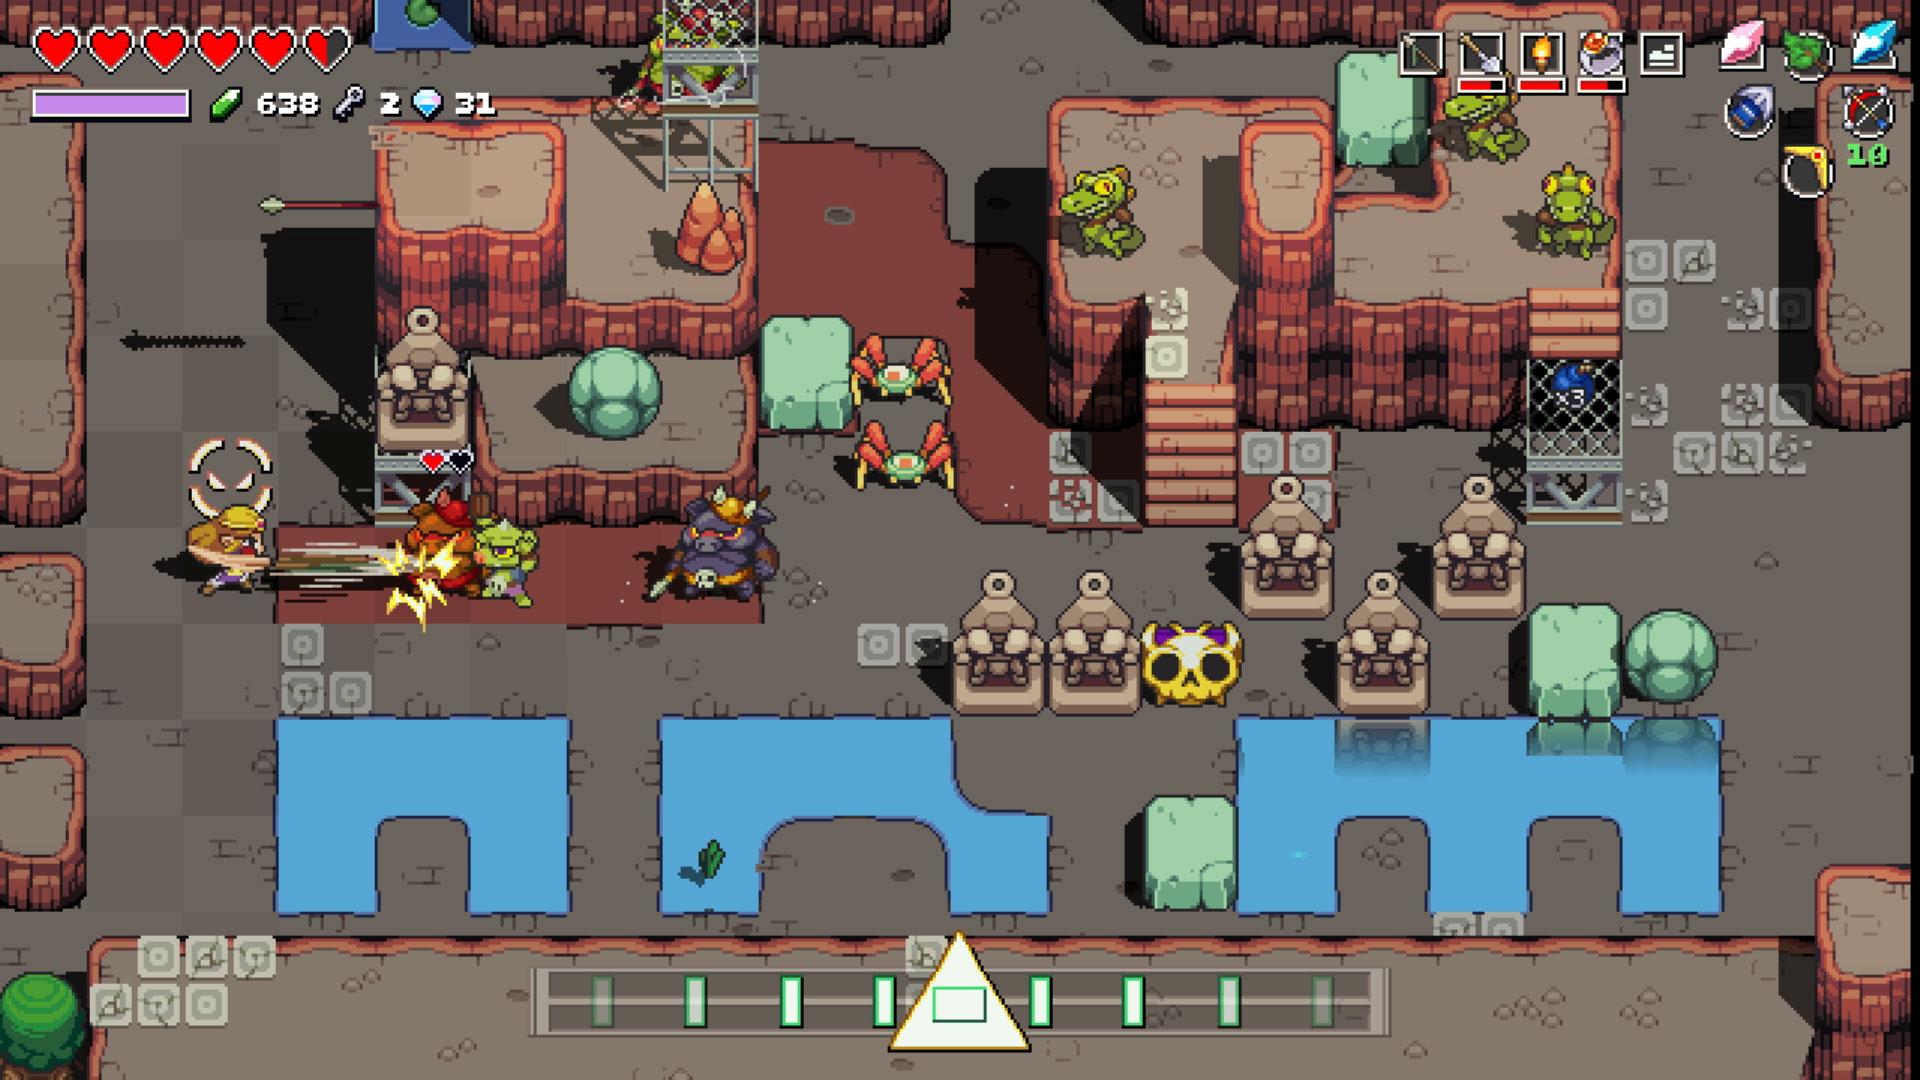 Cadence of Hyrule is a Zelda rhythm game that demands you